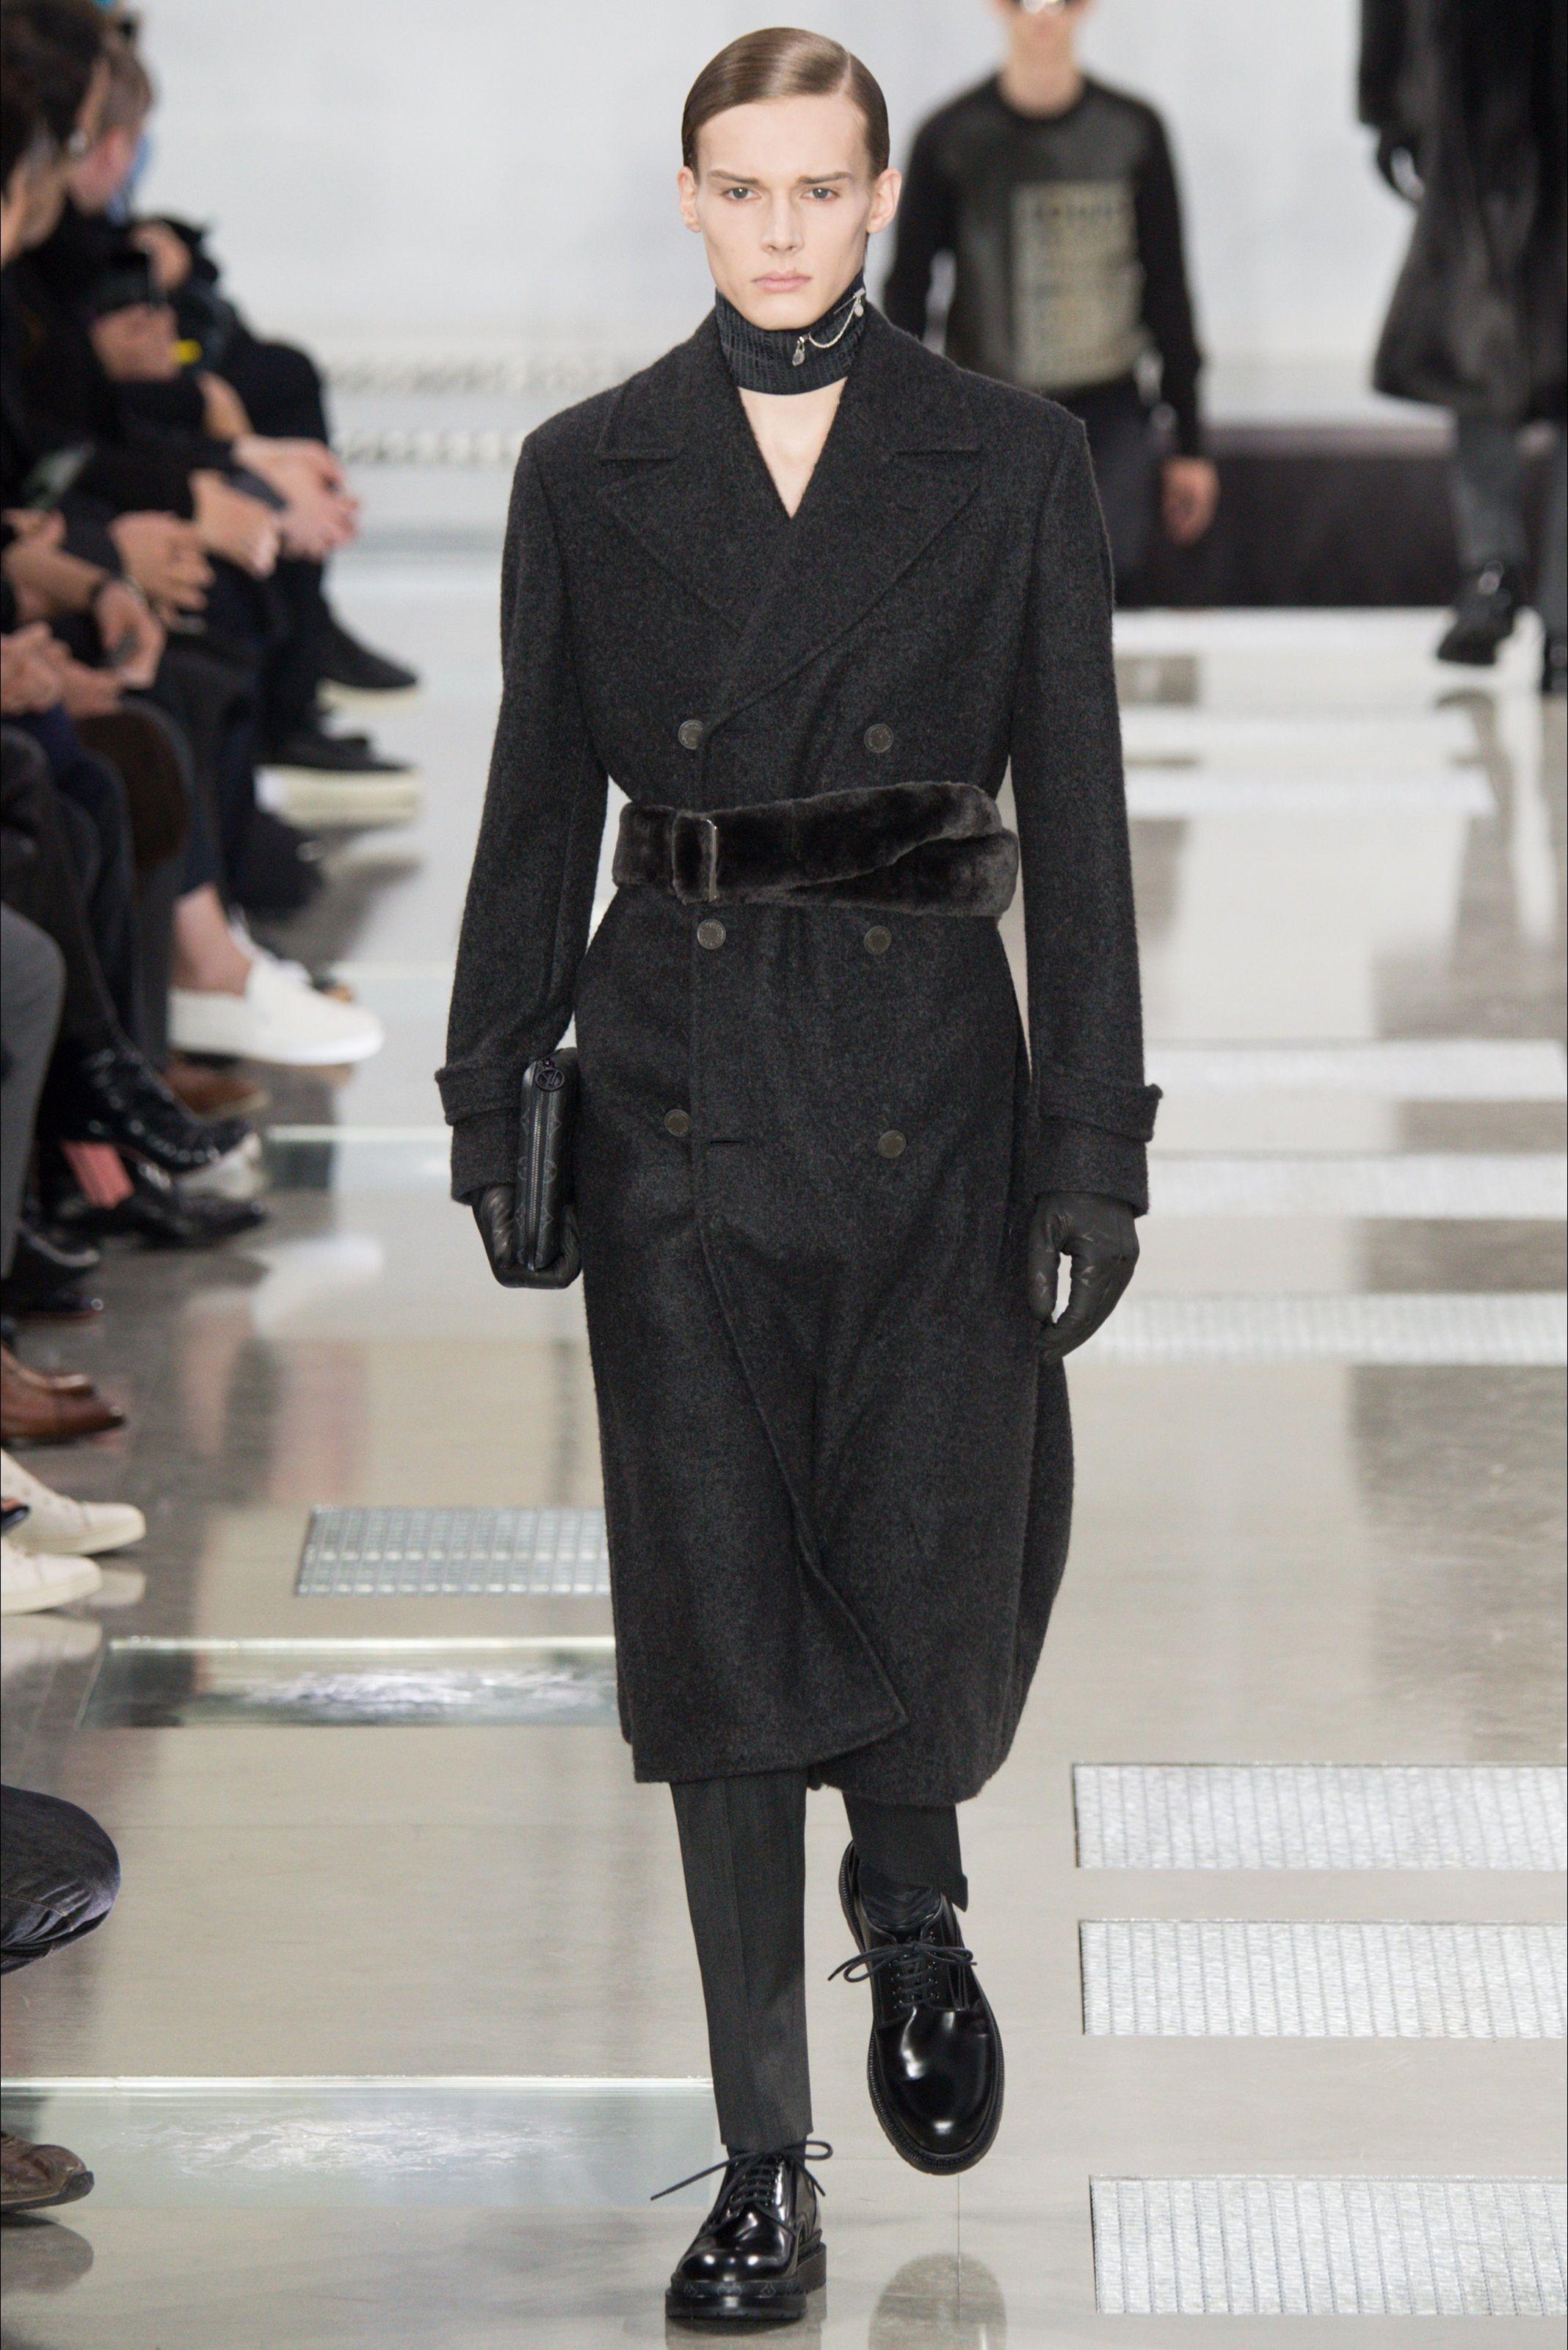 44++ Moda autunno inverno 2016 donna inspirations